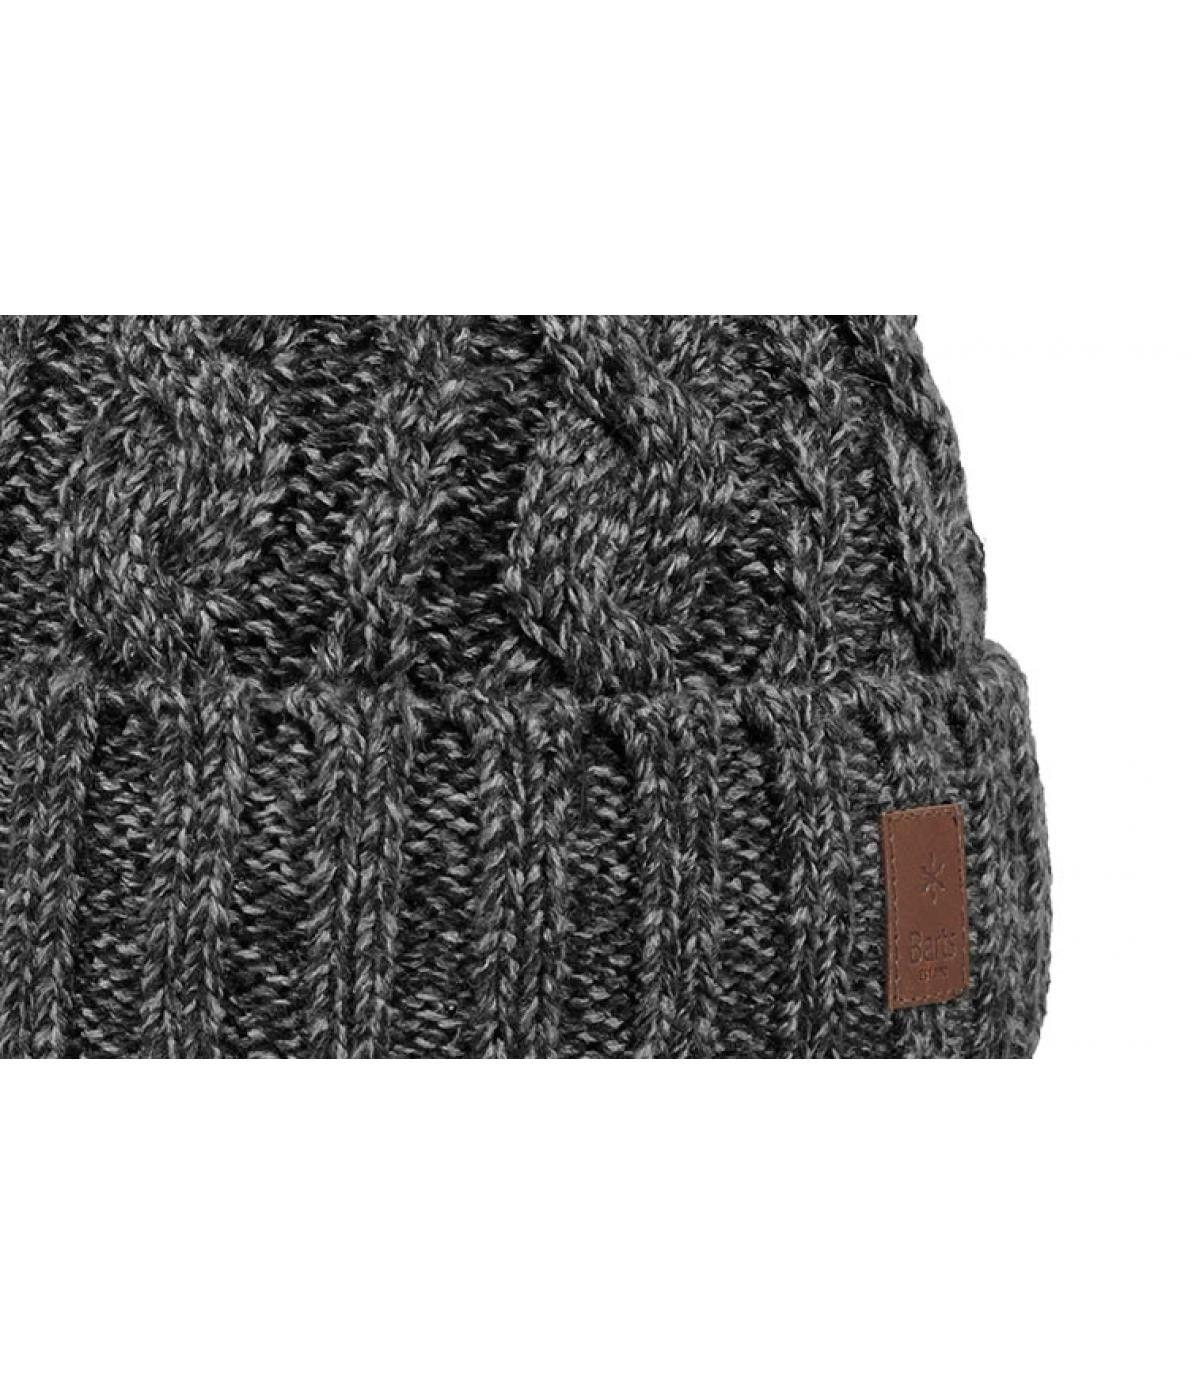 Details Twister Turnup black - Abbildung 3